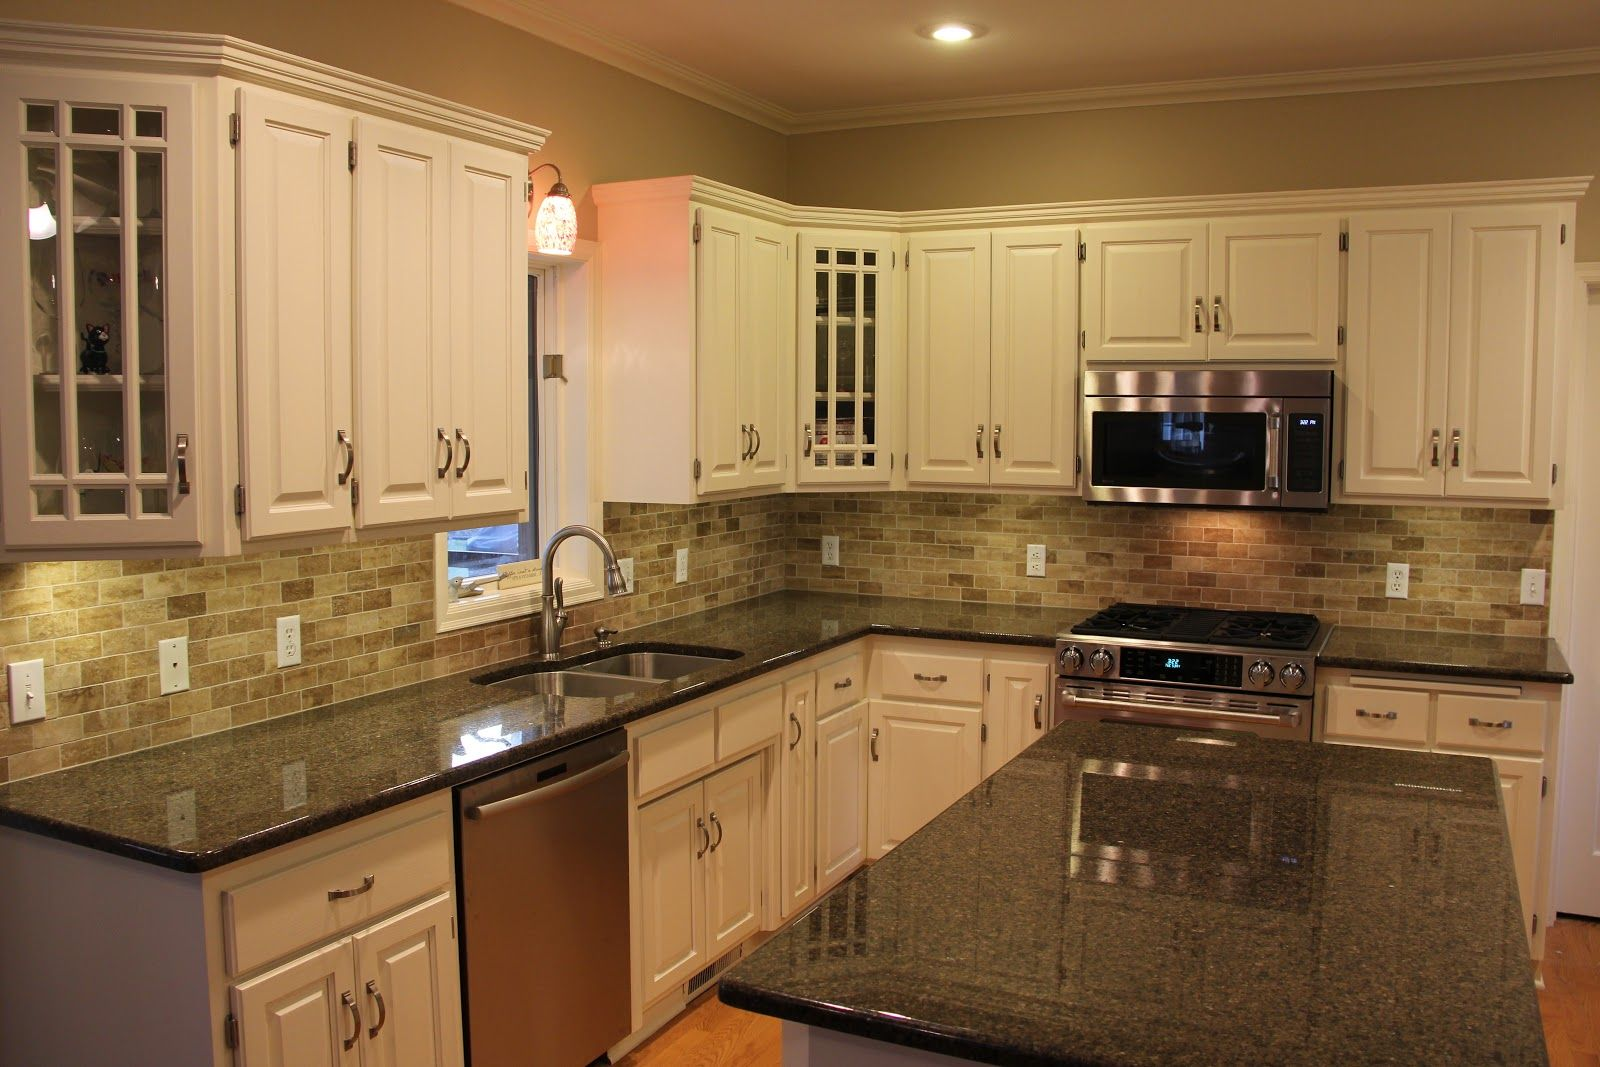 Black kitchen granite countertops with tile backsplash and ... on Backsplash For Dark Granite  id=51890